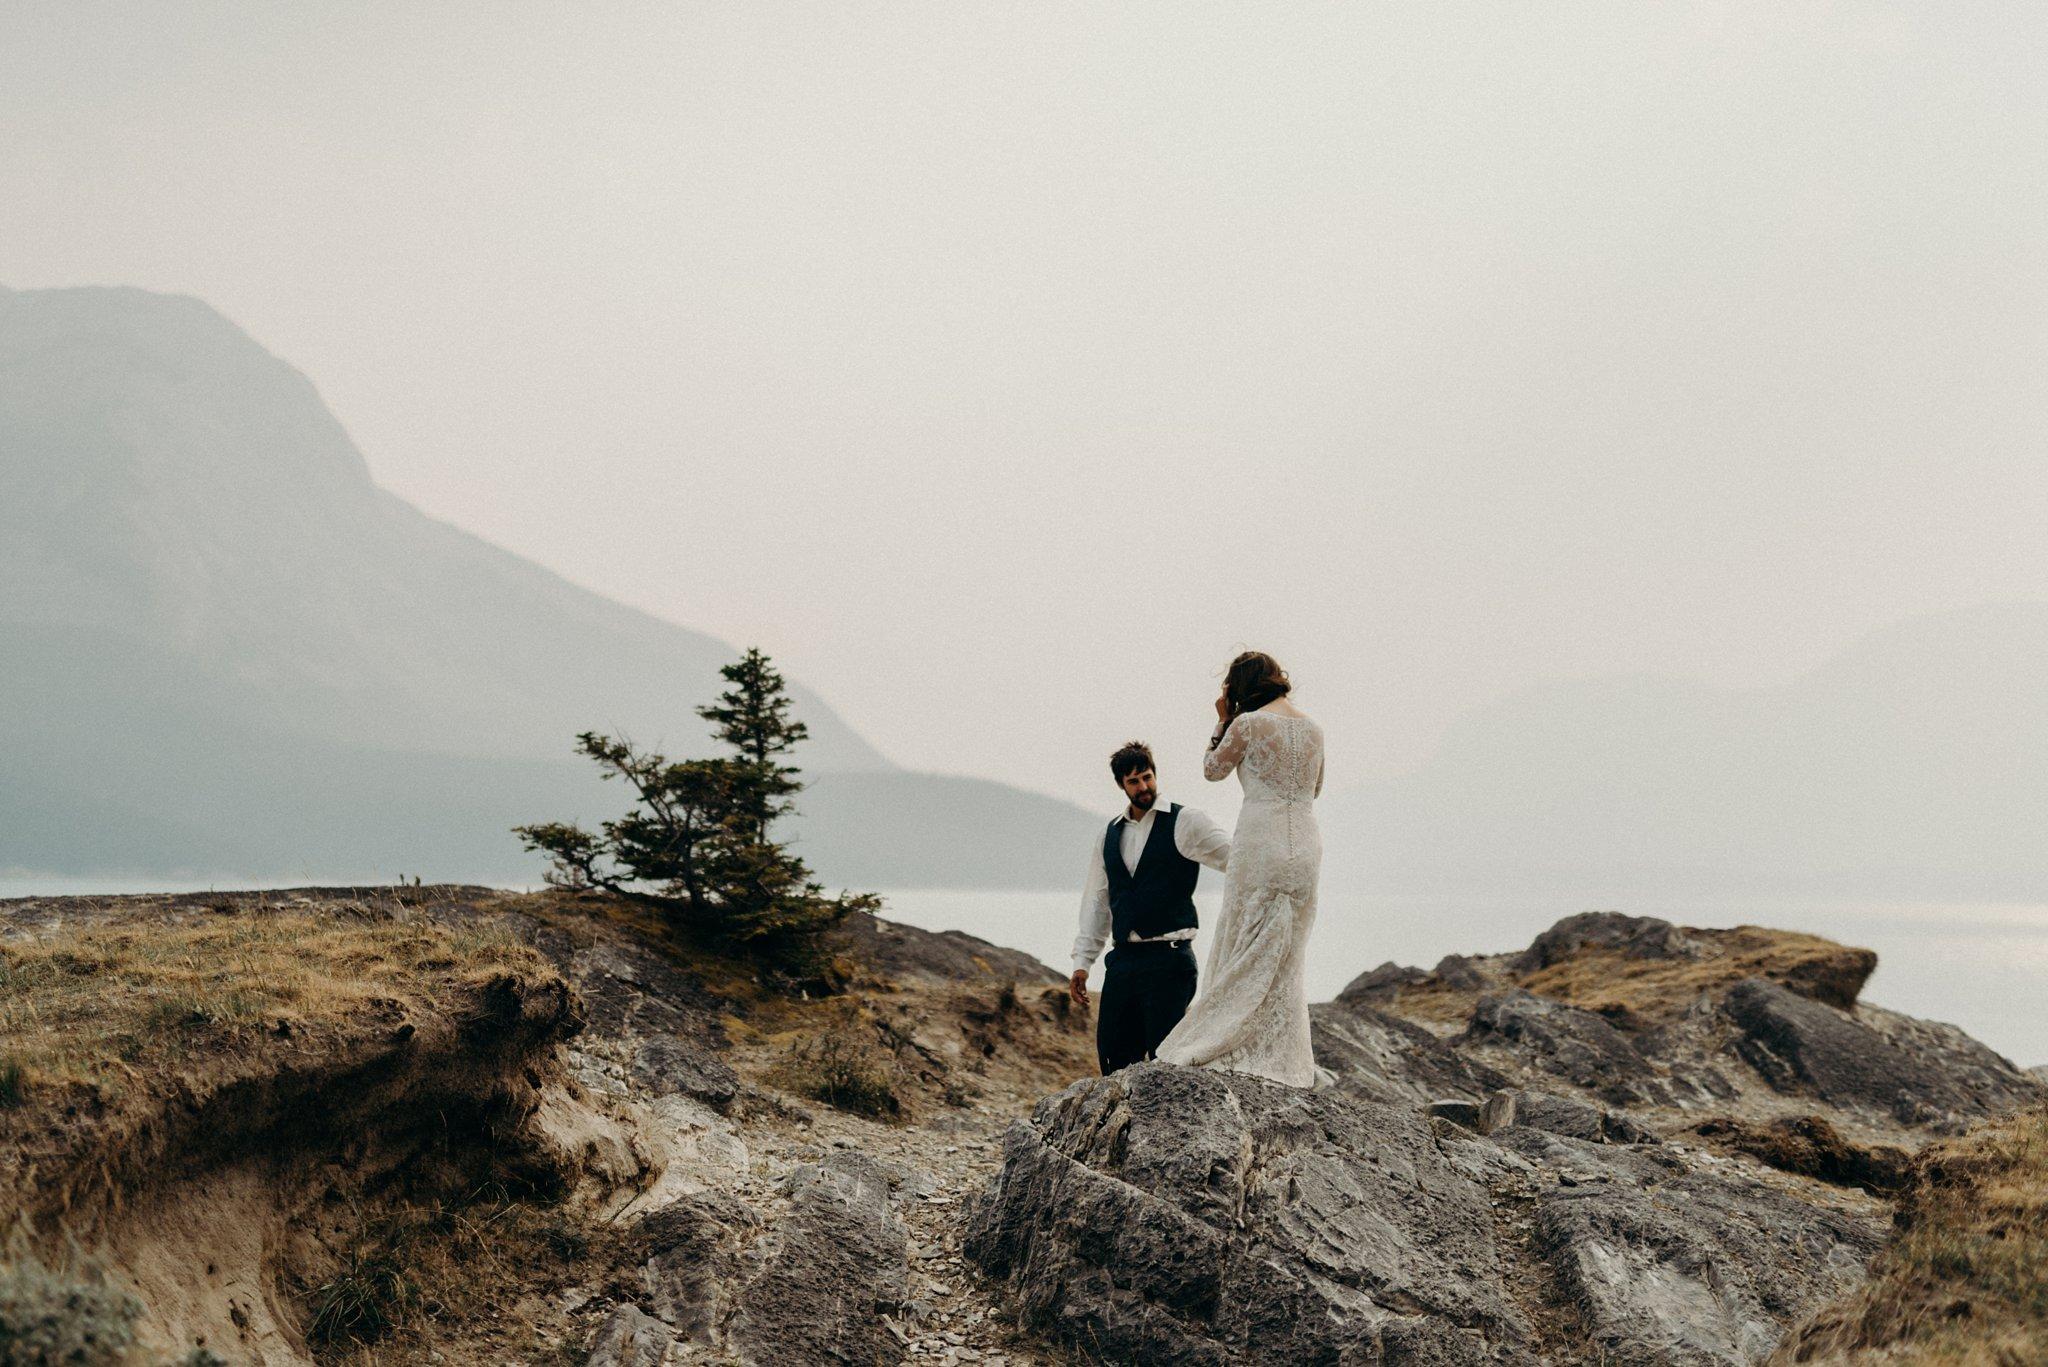 kaihla_tonai_intimate_wedding_elopement_photographer_6746.jpg